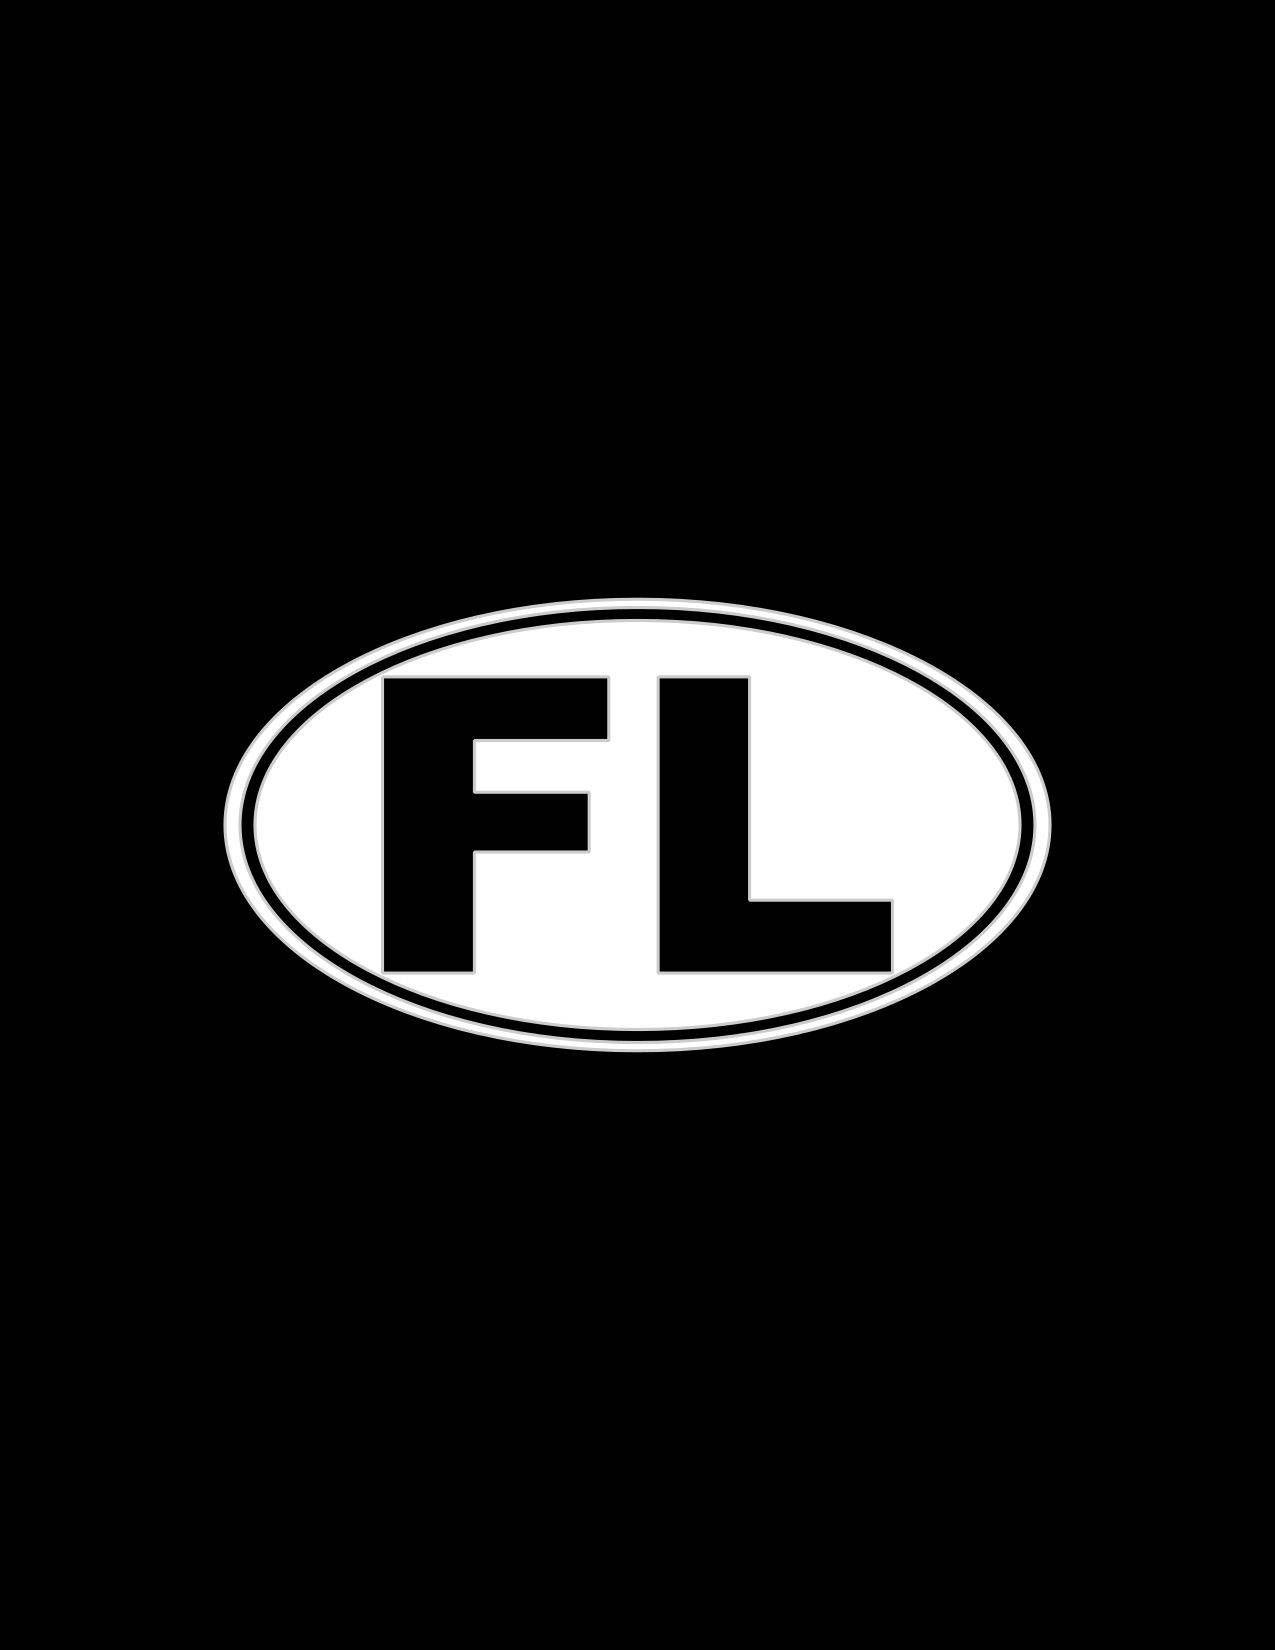 Florida Decal Florida State Car Decal Florida Sticker Window Etsy Florida State Car Decals Custom Decals [ 1650 x 1275 Pixel ]